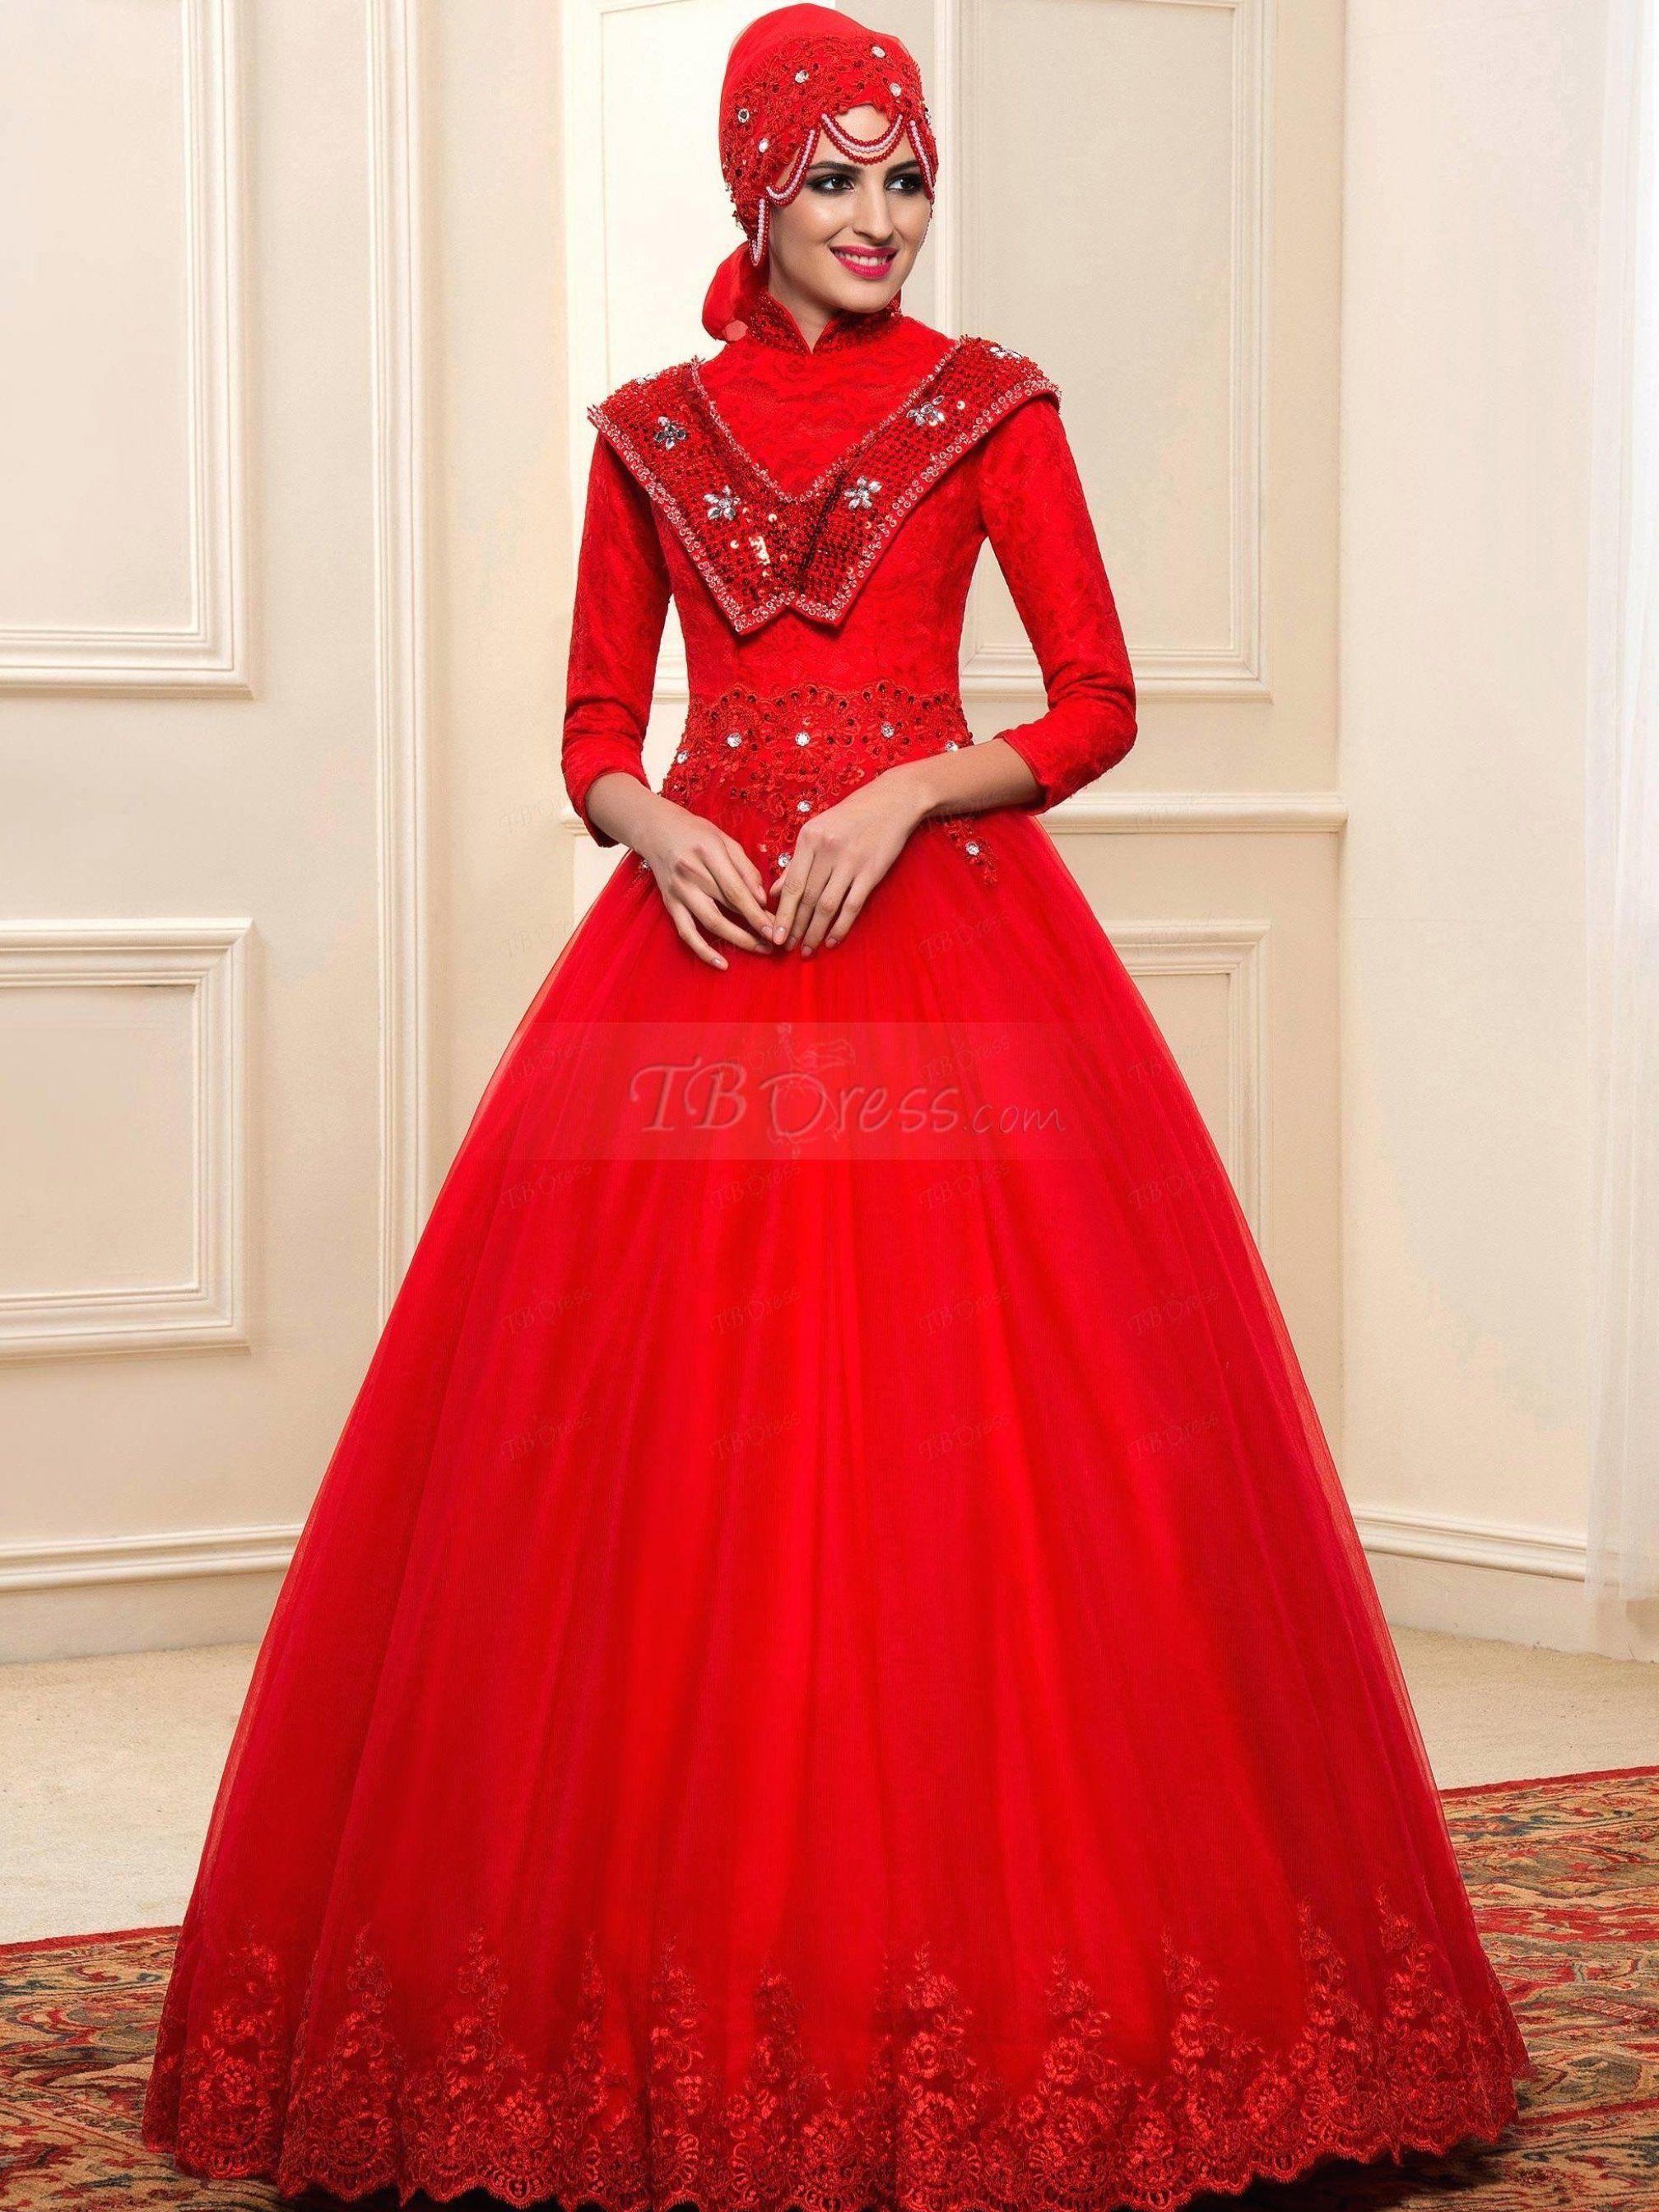 Simple Islamic Wedding Dresses Hijabiworld Weddingdresses Weddingdressesvintage Weddingdr Arabic Wedding Dresses Muslim Wedding Dress Red Wedding Dresses [ 2688 x 2016 Pixel ]